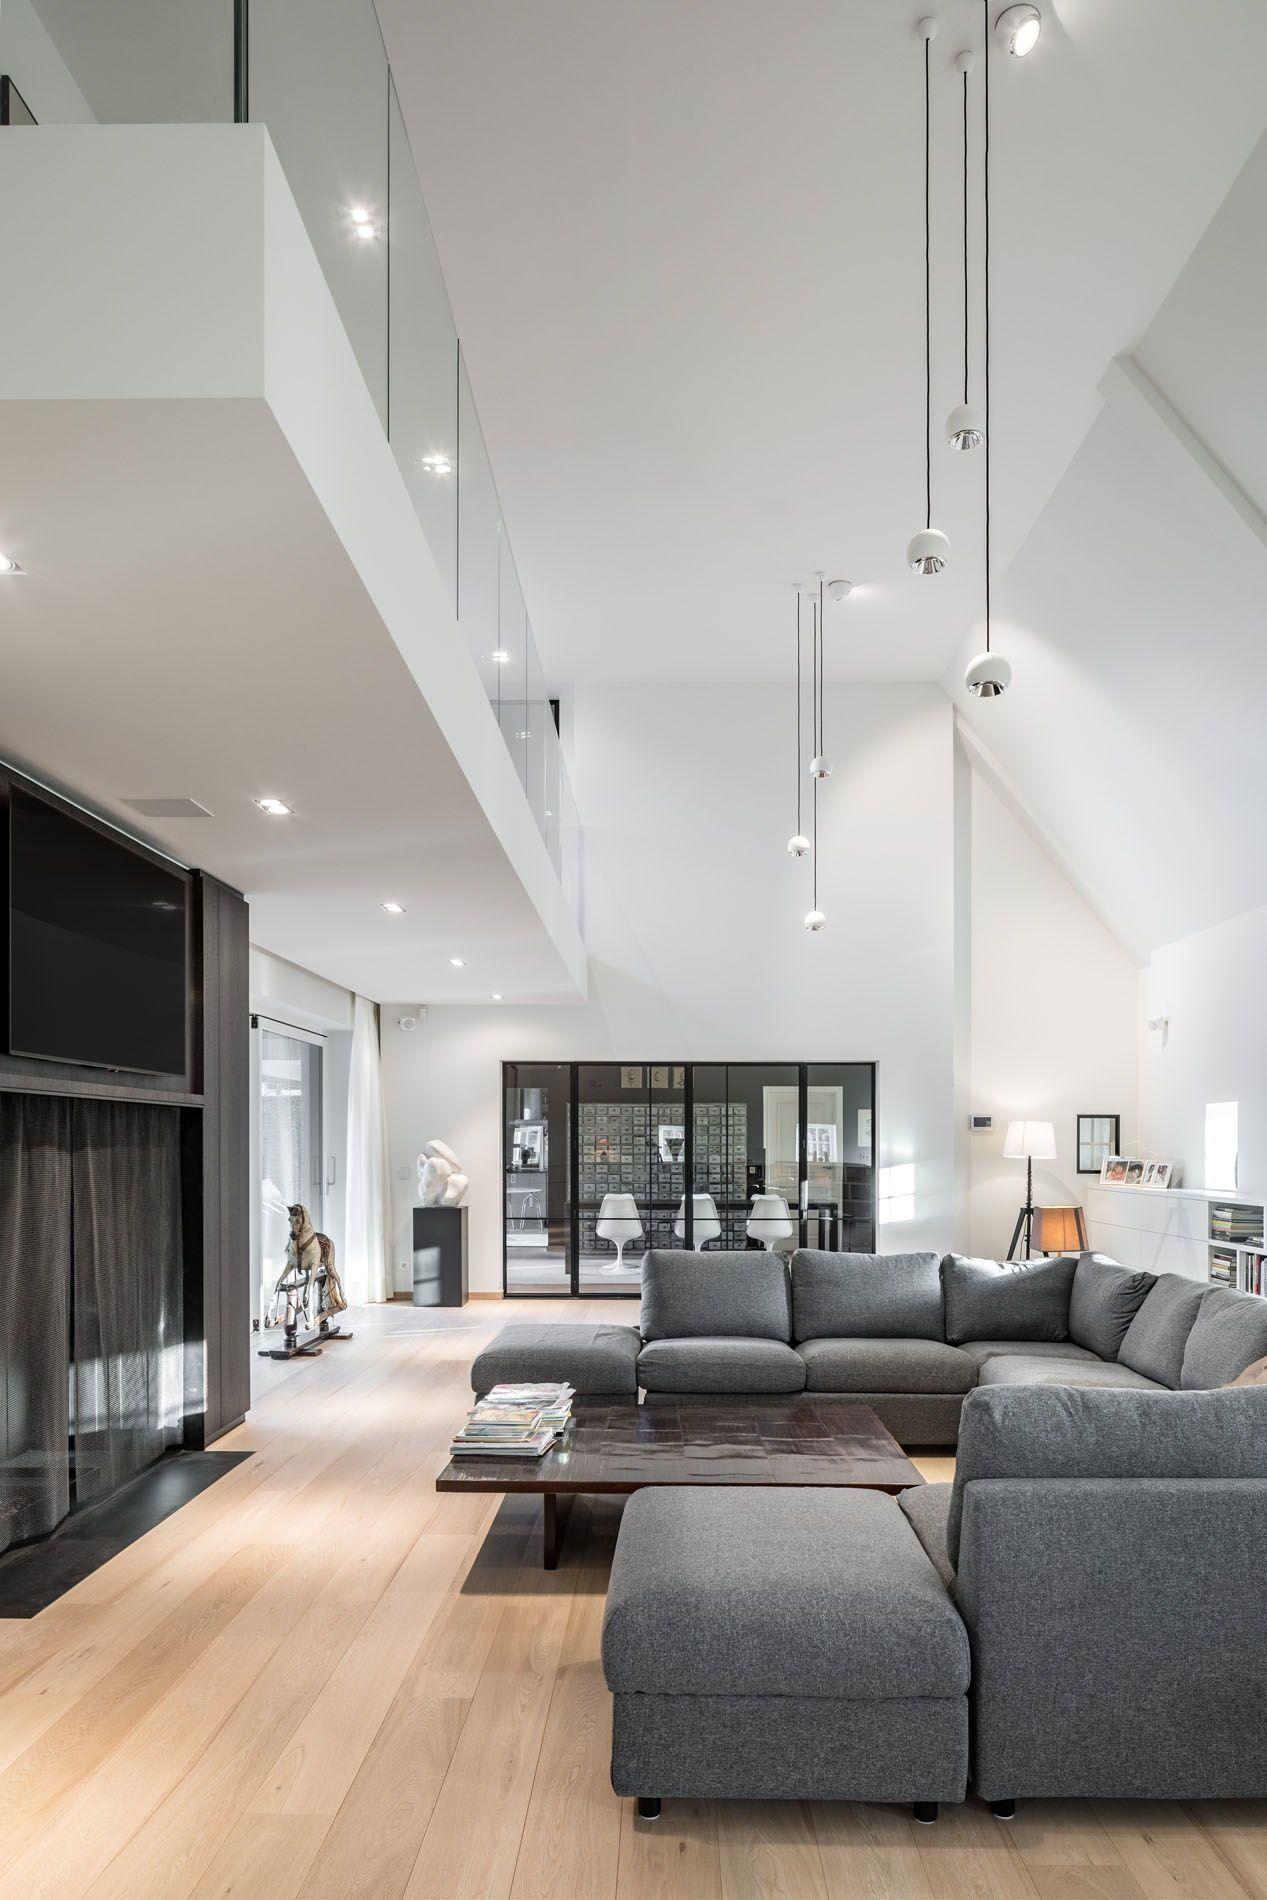 Ideas Needed For Living Room Lighting Bolster Has The